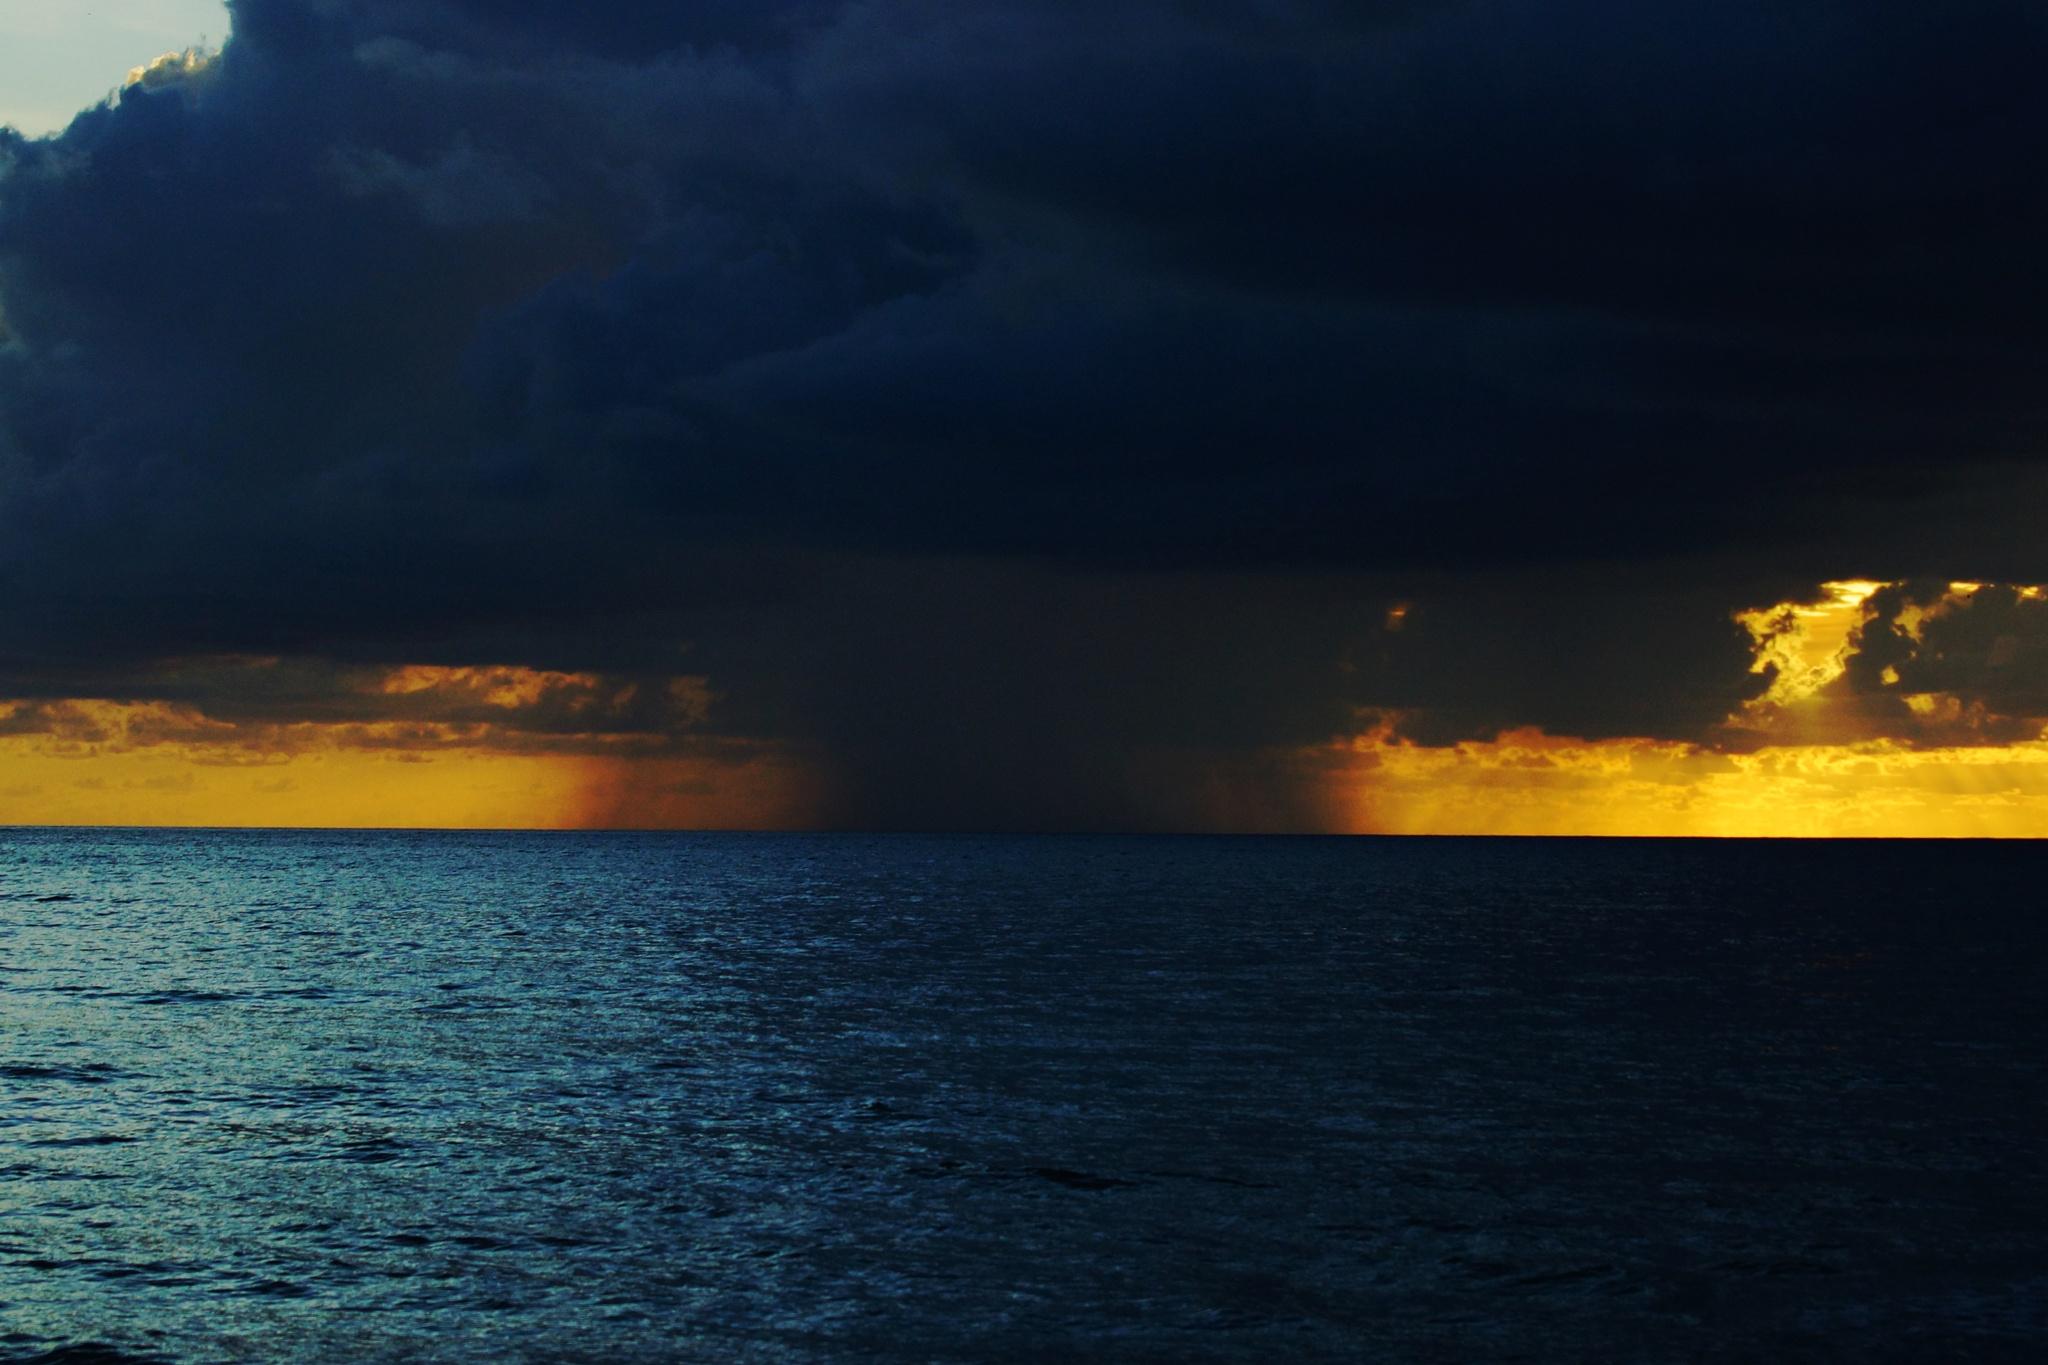 Weather by Sorin Gudumac